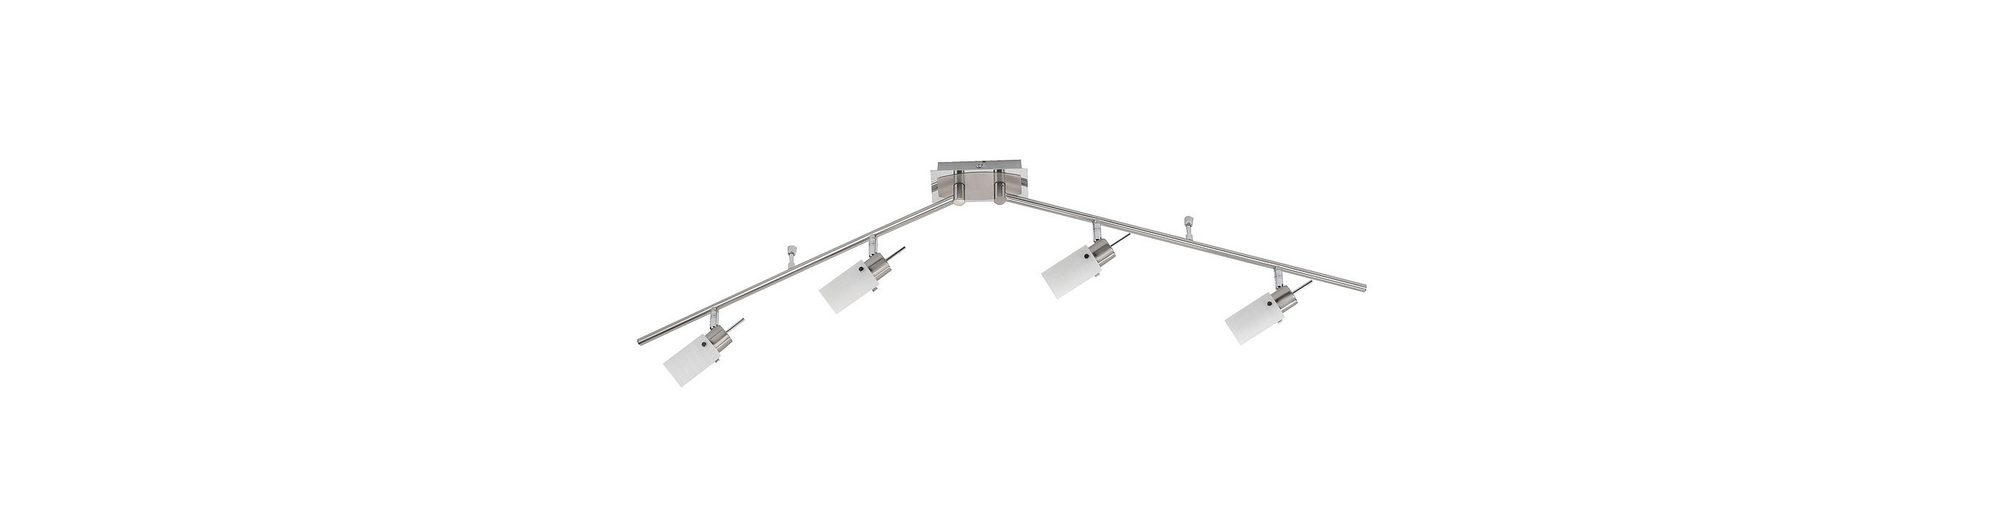 LED-Deckenlampe, Paul Neuhaus